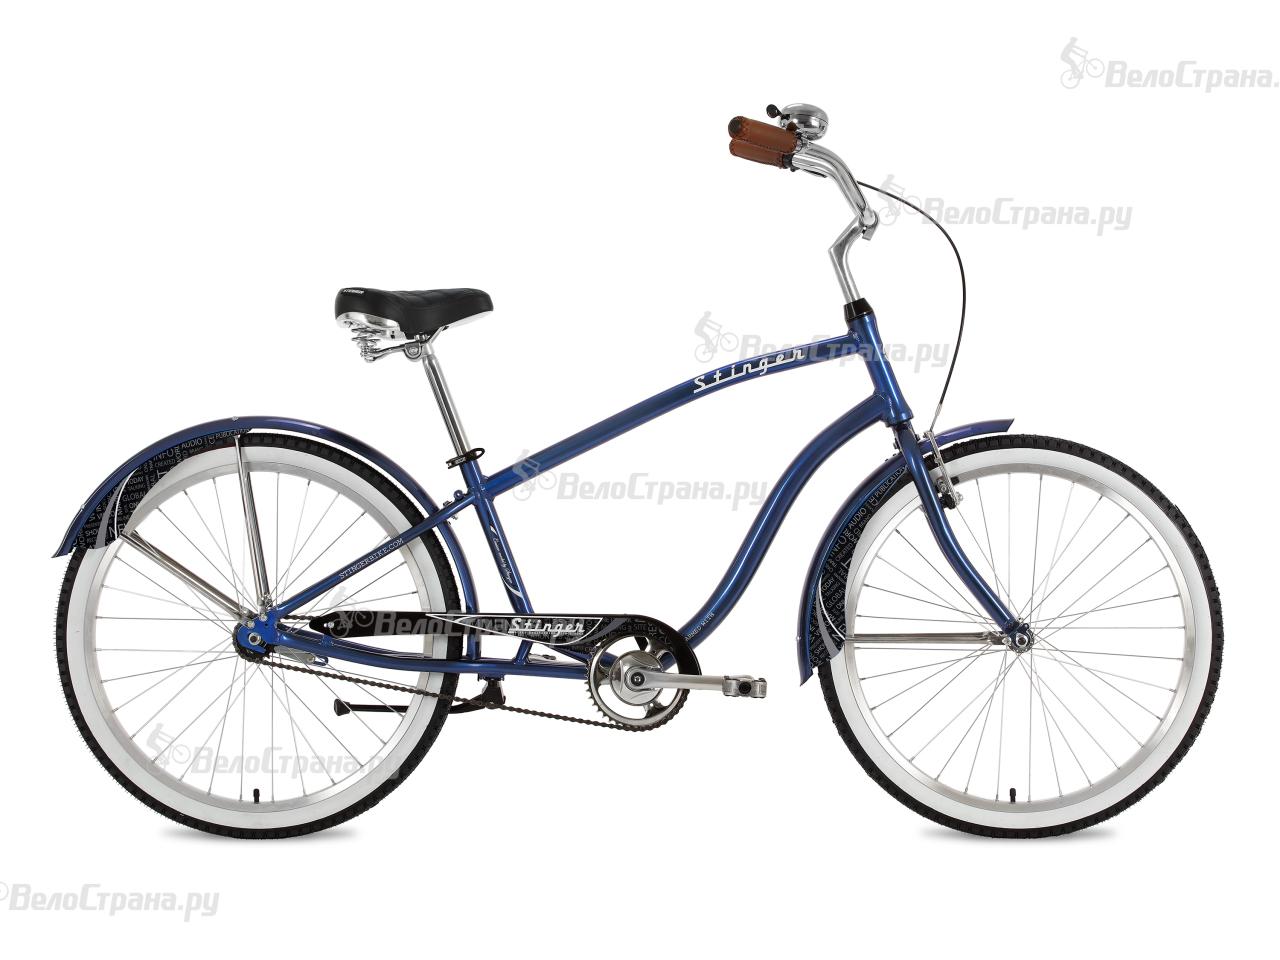 Велосипед Stinger Cruiser 26 (2018) велосипед stinger cruiser lady 26 2017